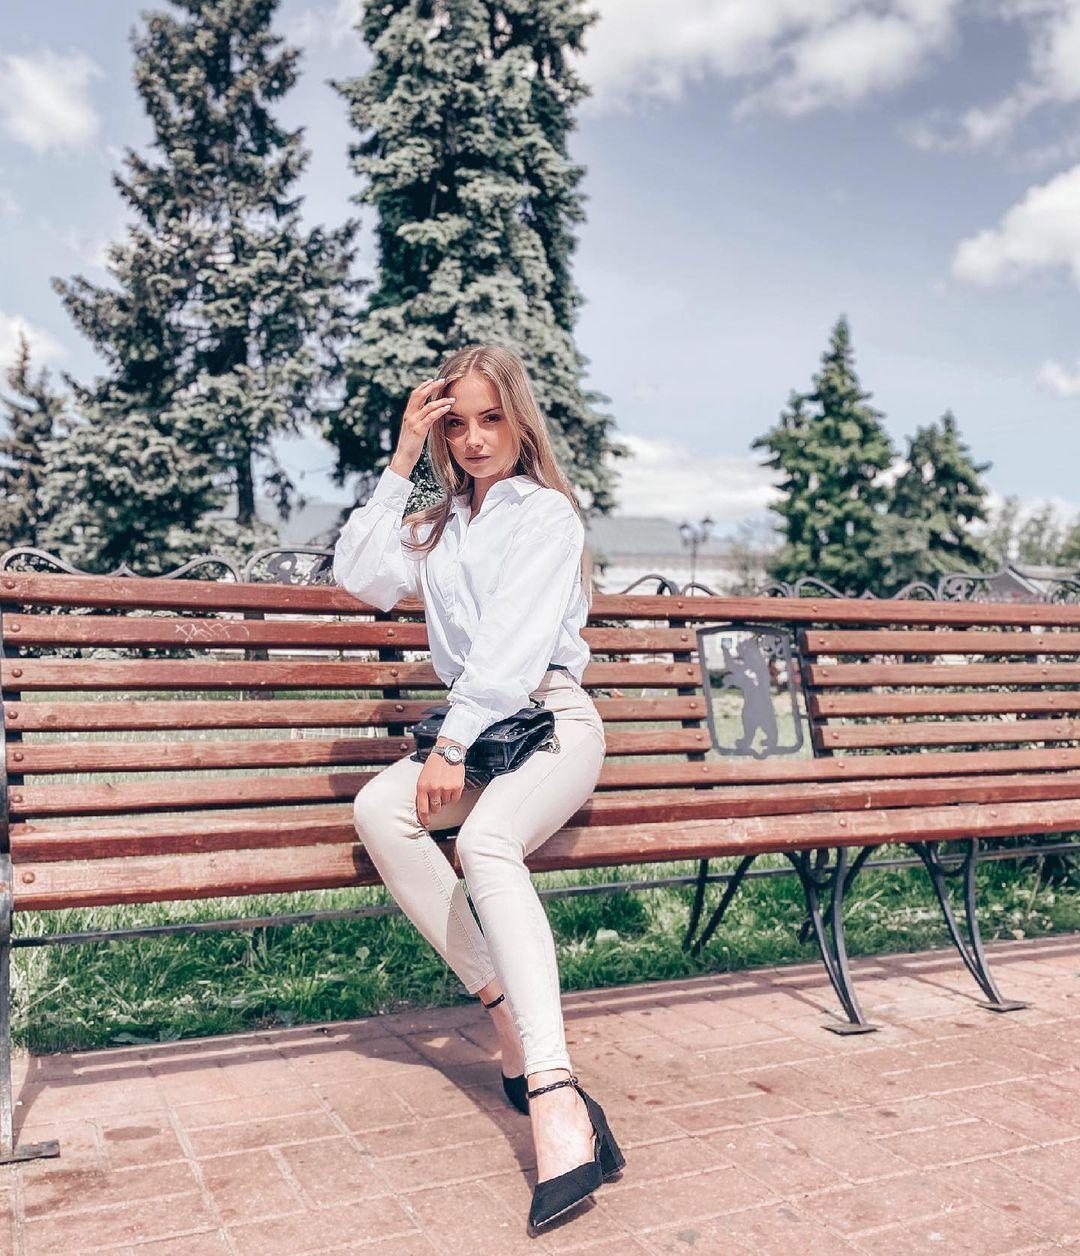 Anastasia-Fefilova-Wallpapers-Insta-Fit-Bio-1